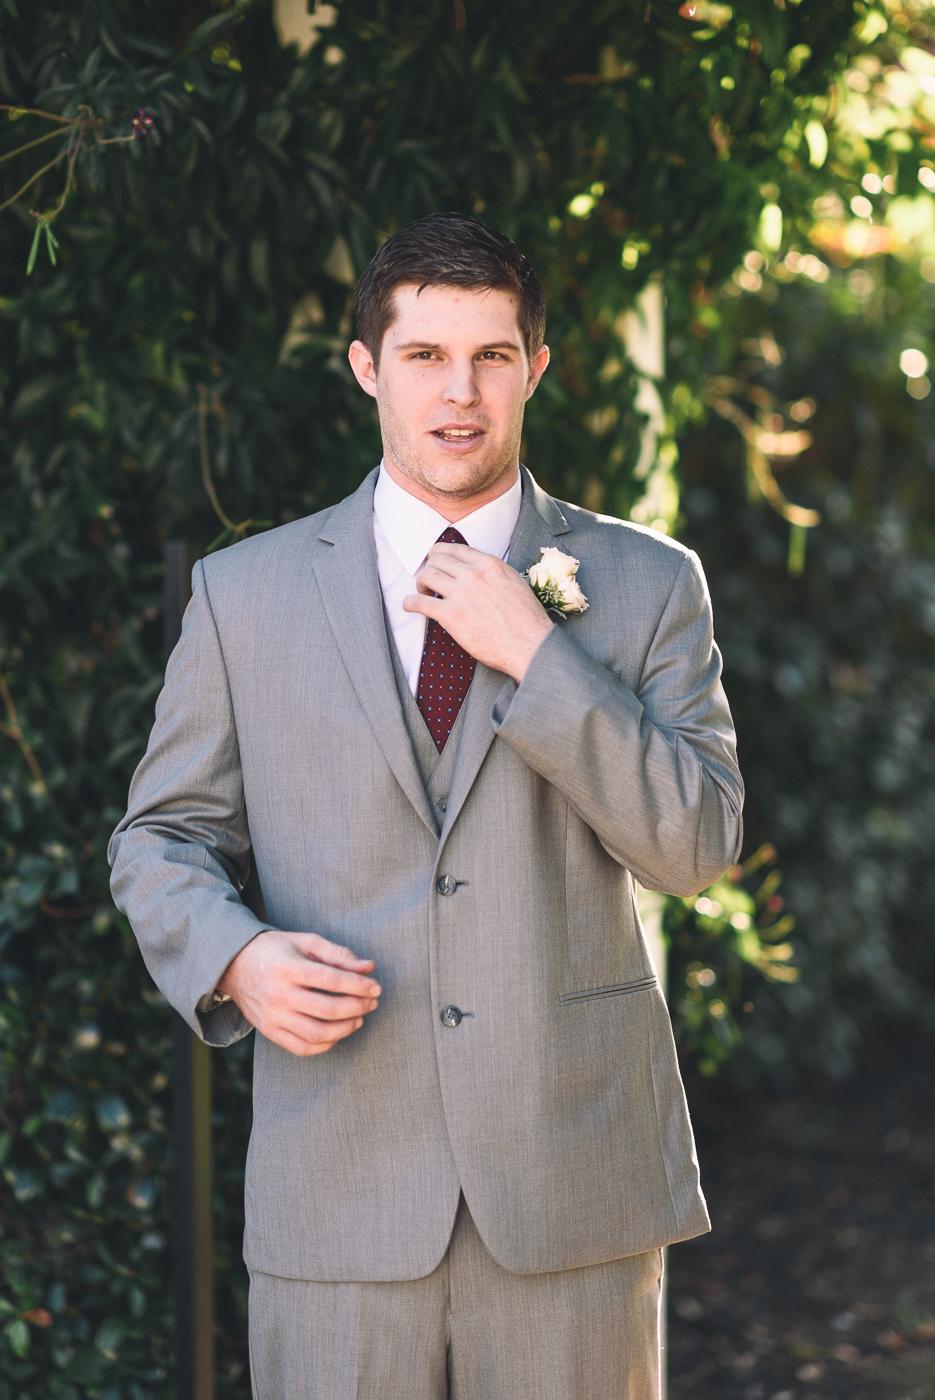 groom portrait maroon tie grey suit boutonniere